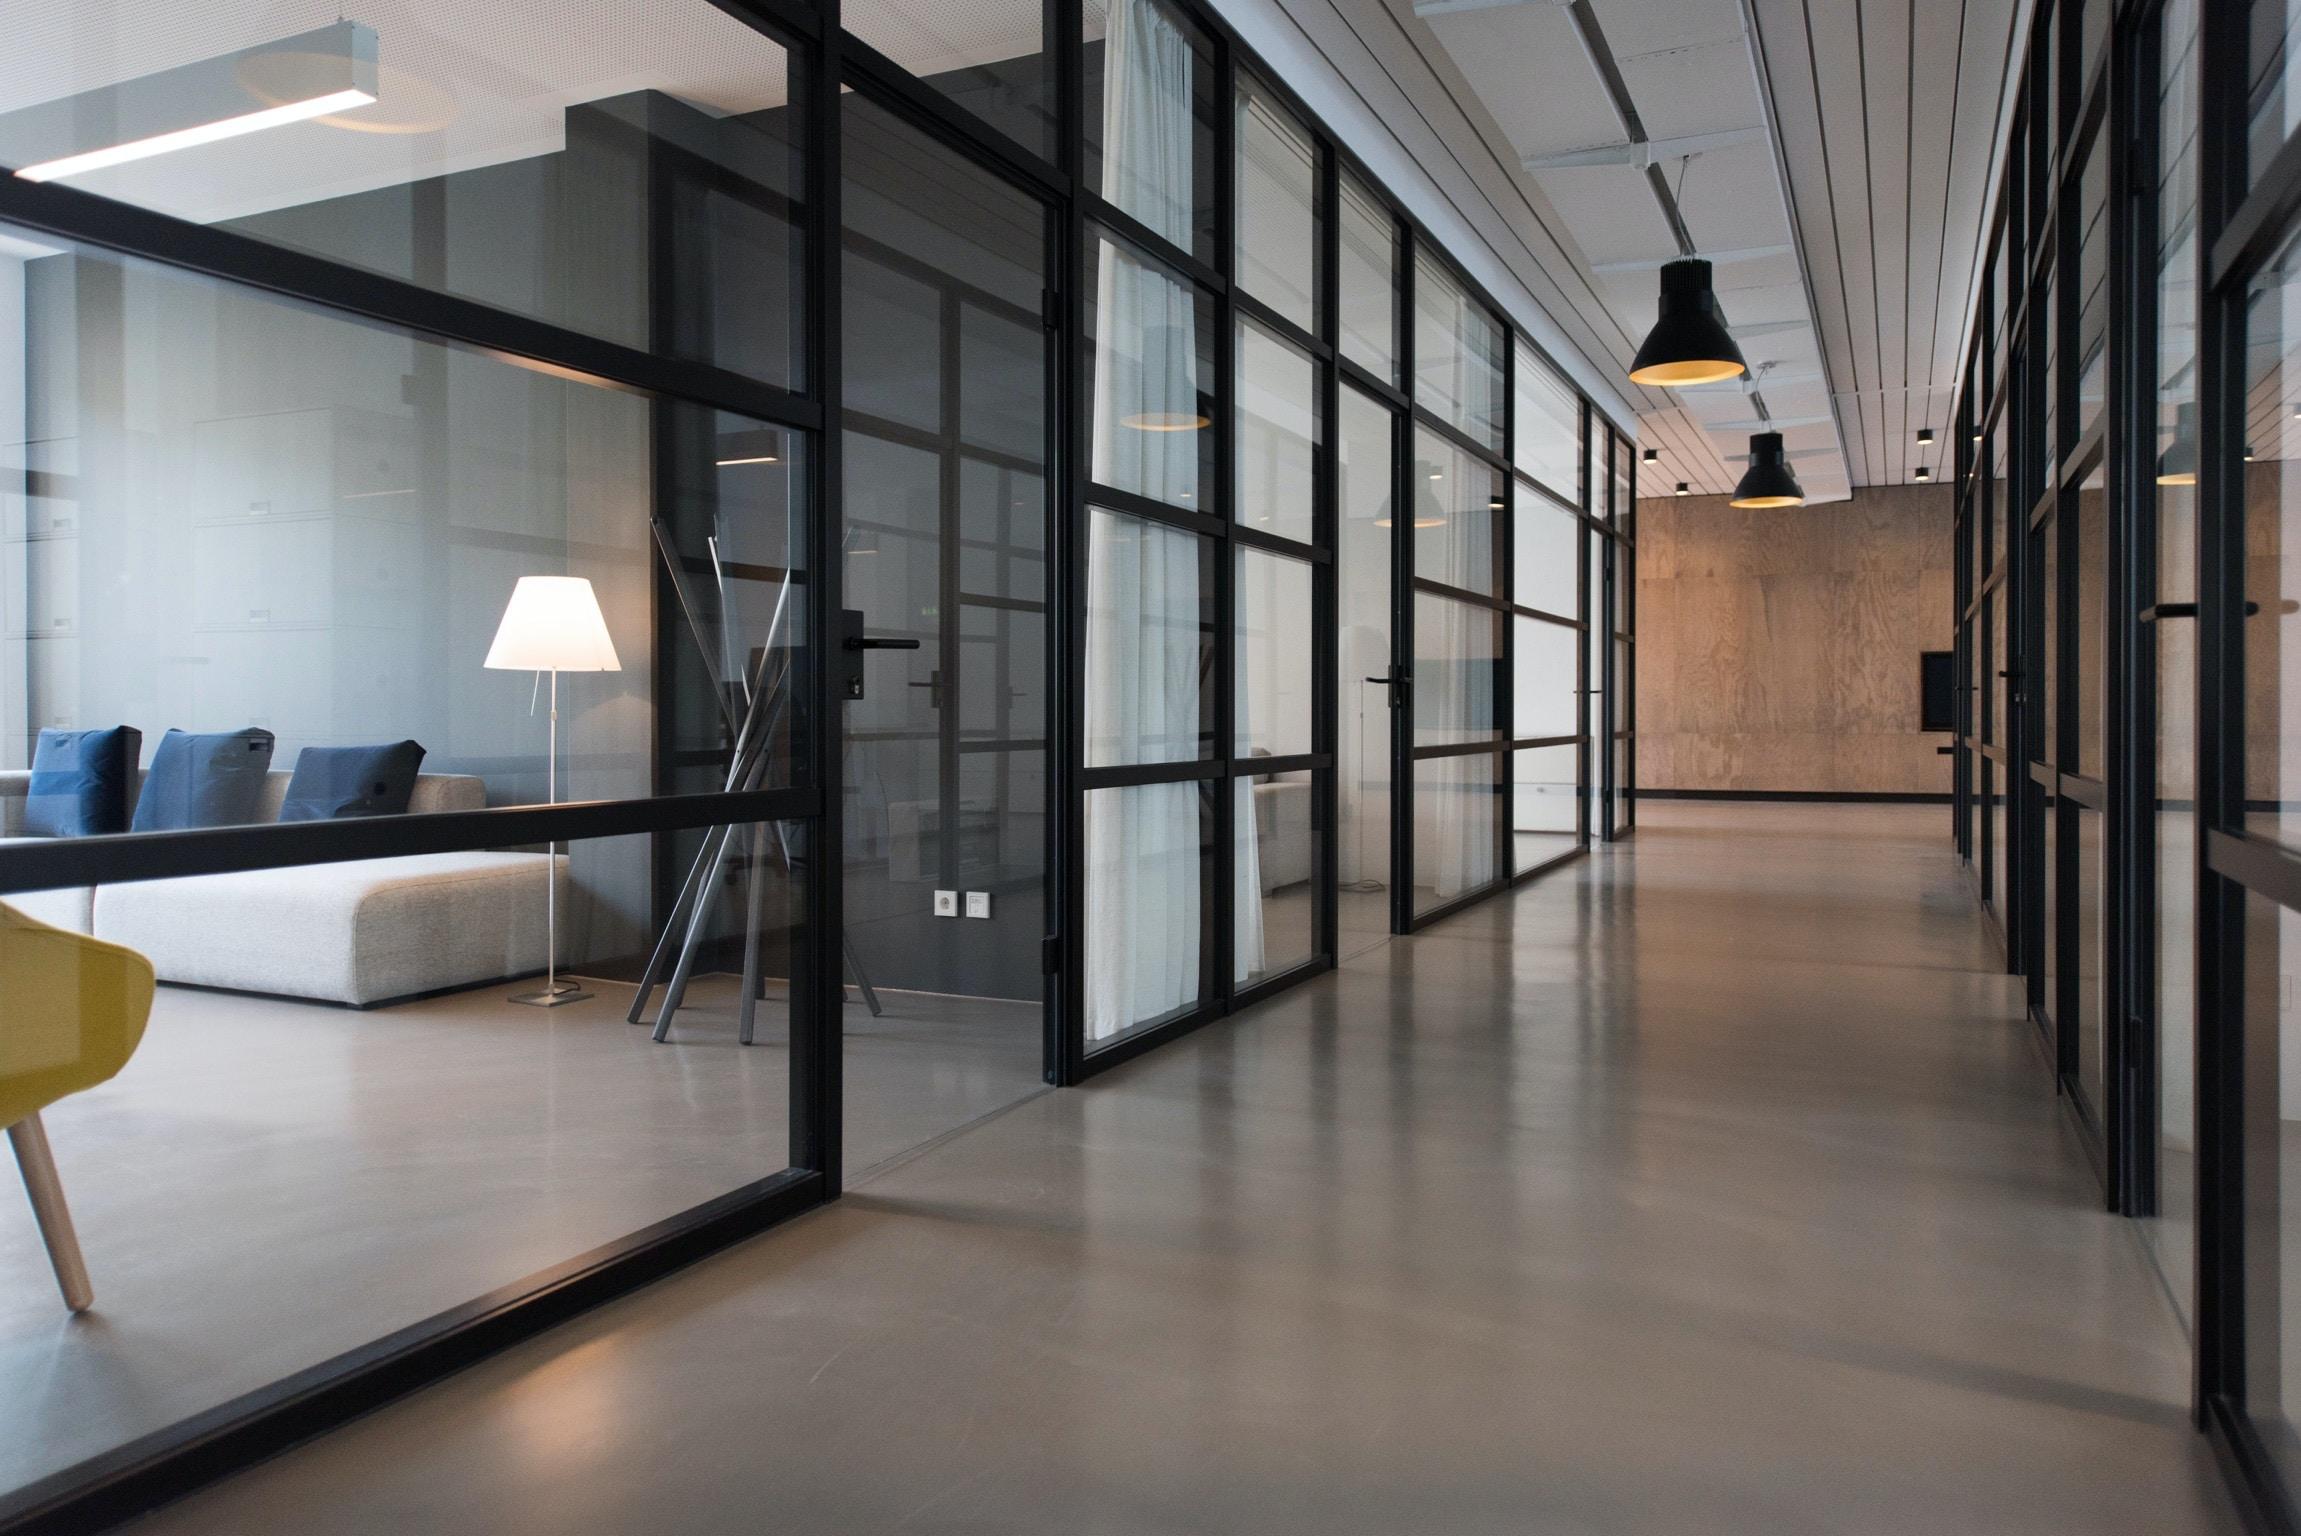 100 office pictures hd download free images on unsplash rh unsplash com